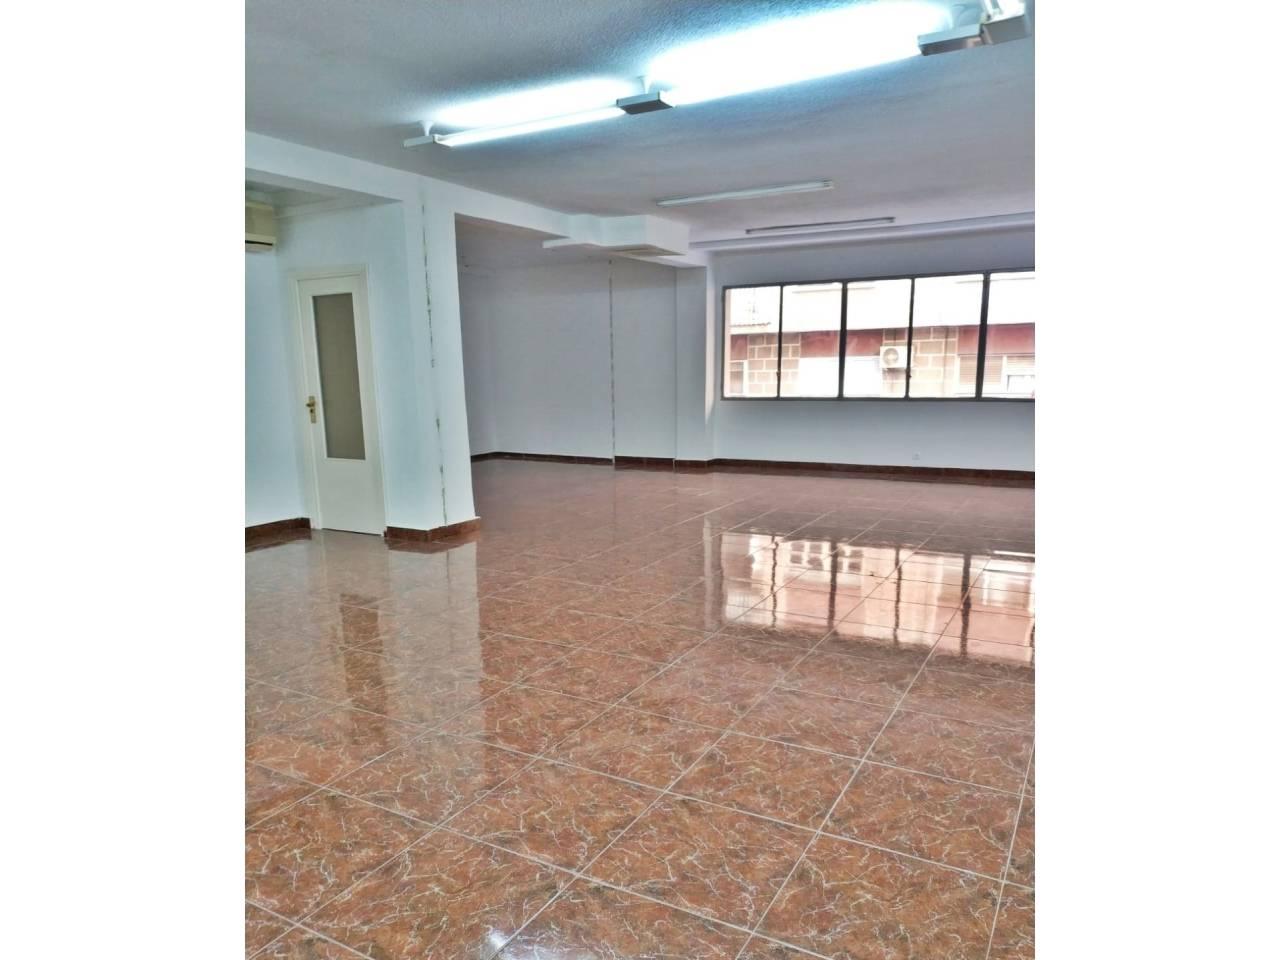 Oficina  Calle avenida teodomiro. Altura piso entresuelo, despacho superficie total 130 m², superf